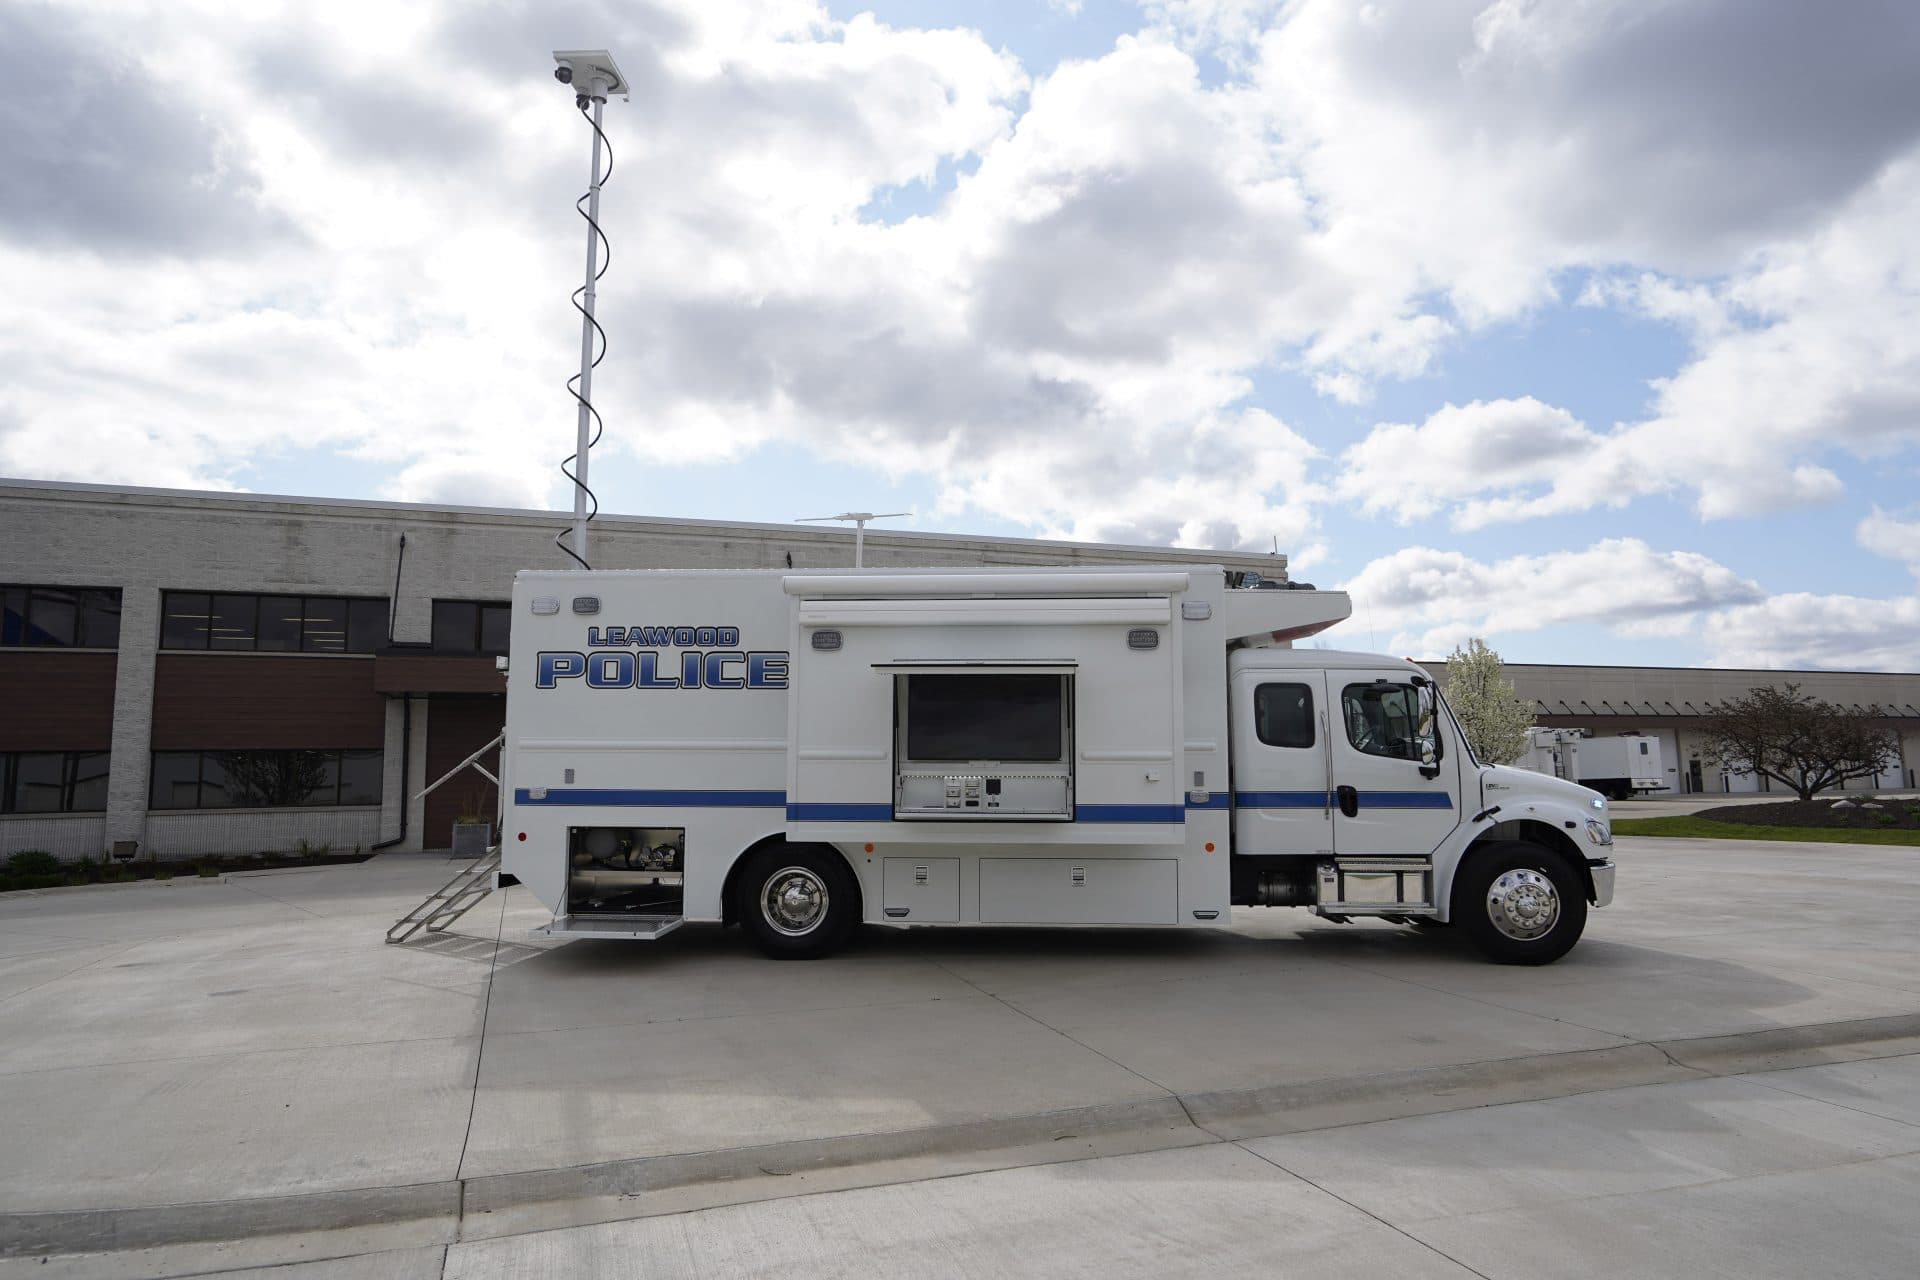 Leawood PD Mobile Command LDV